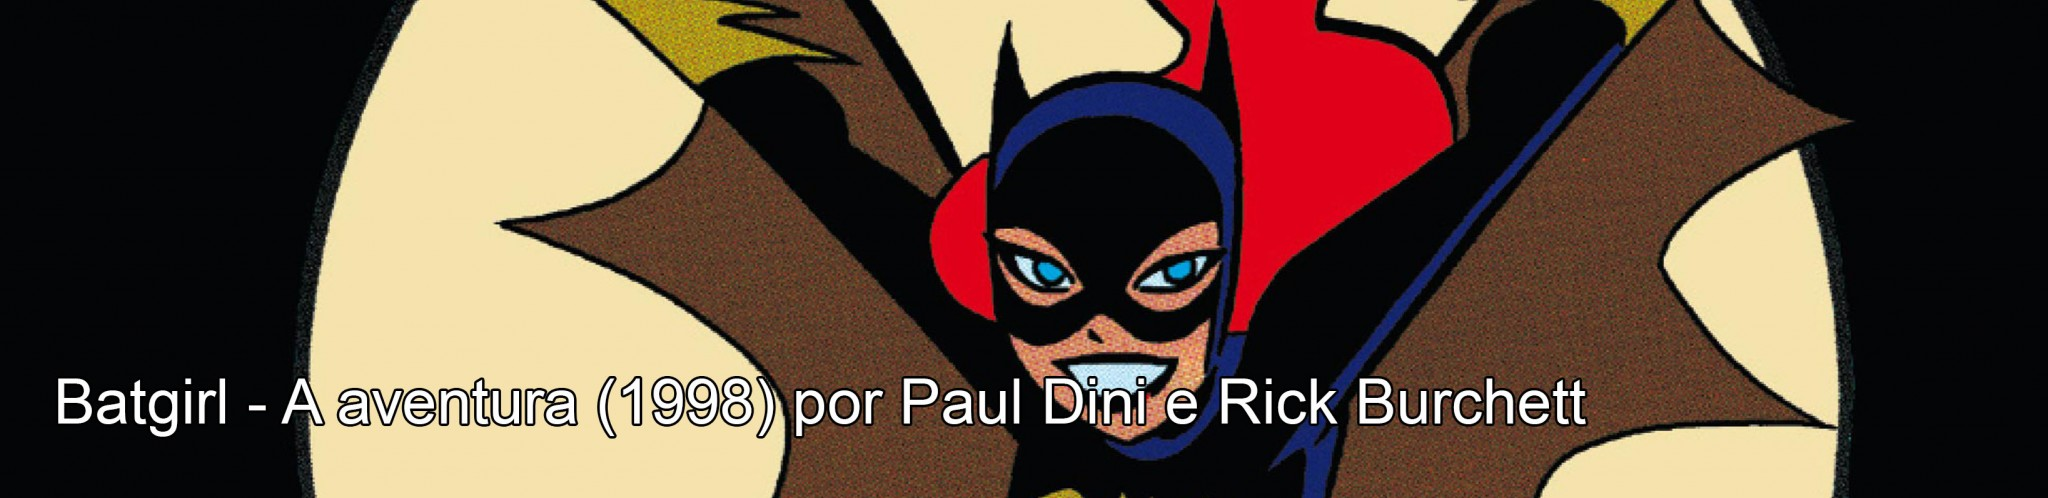 por Paul Dini e Rick Burchett